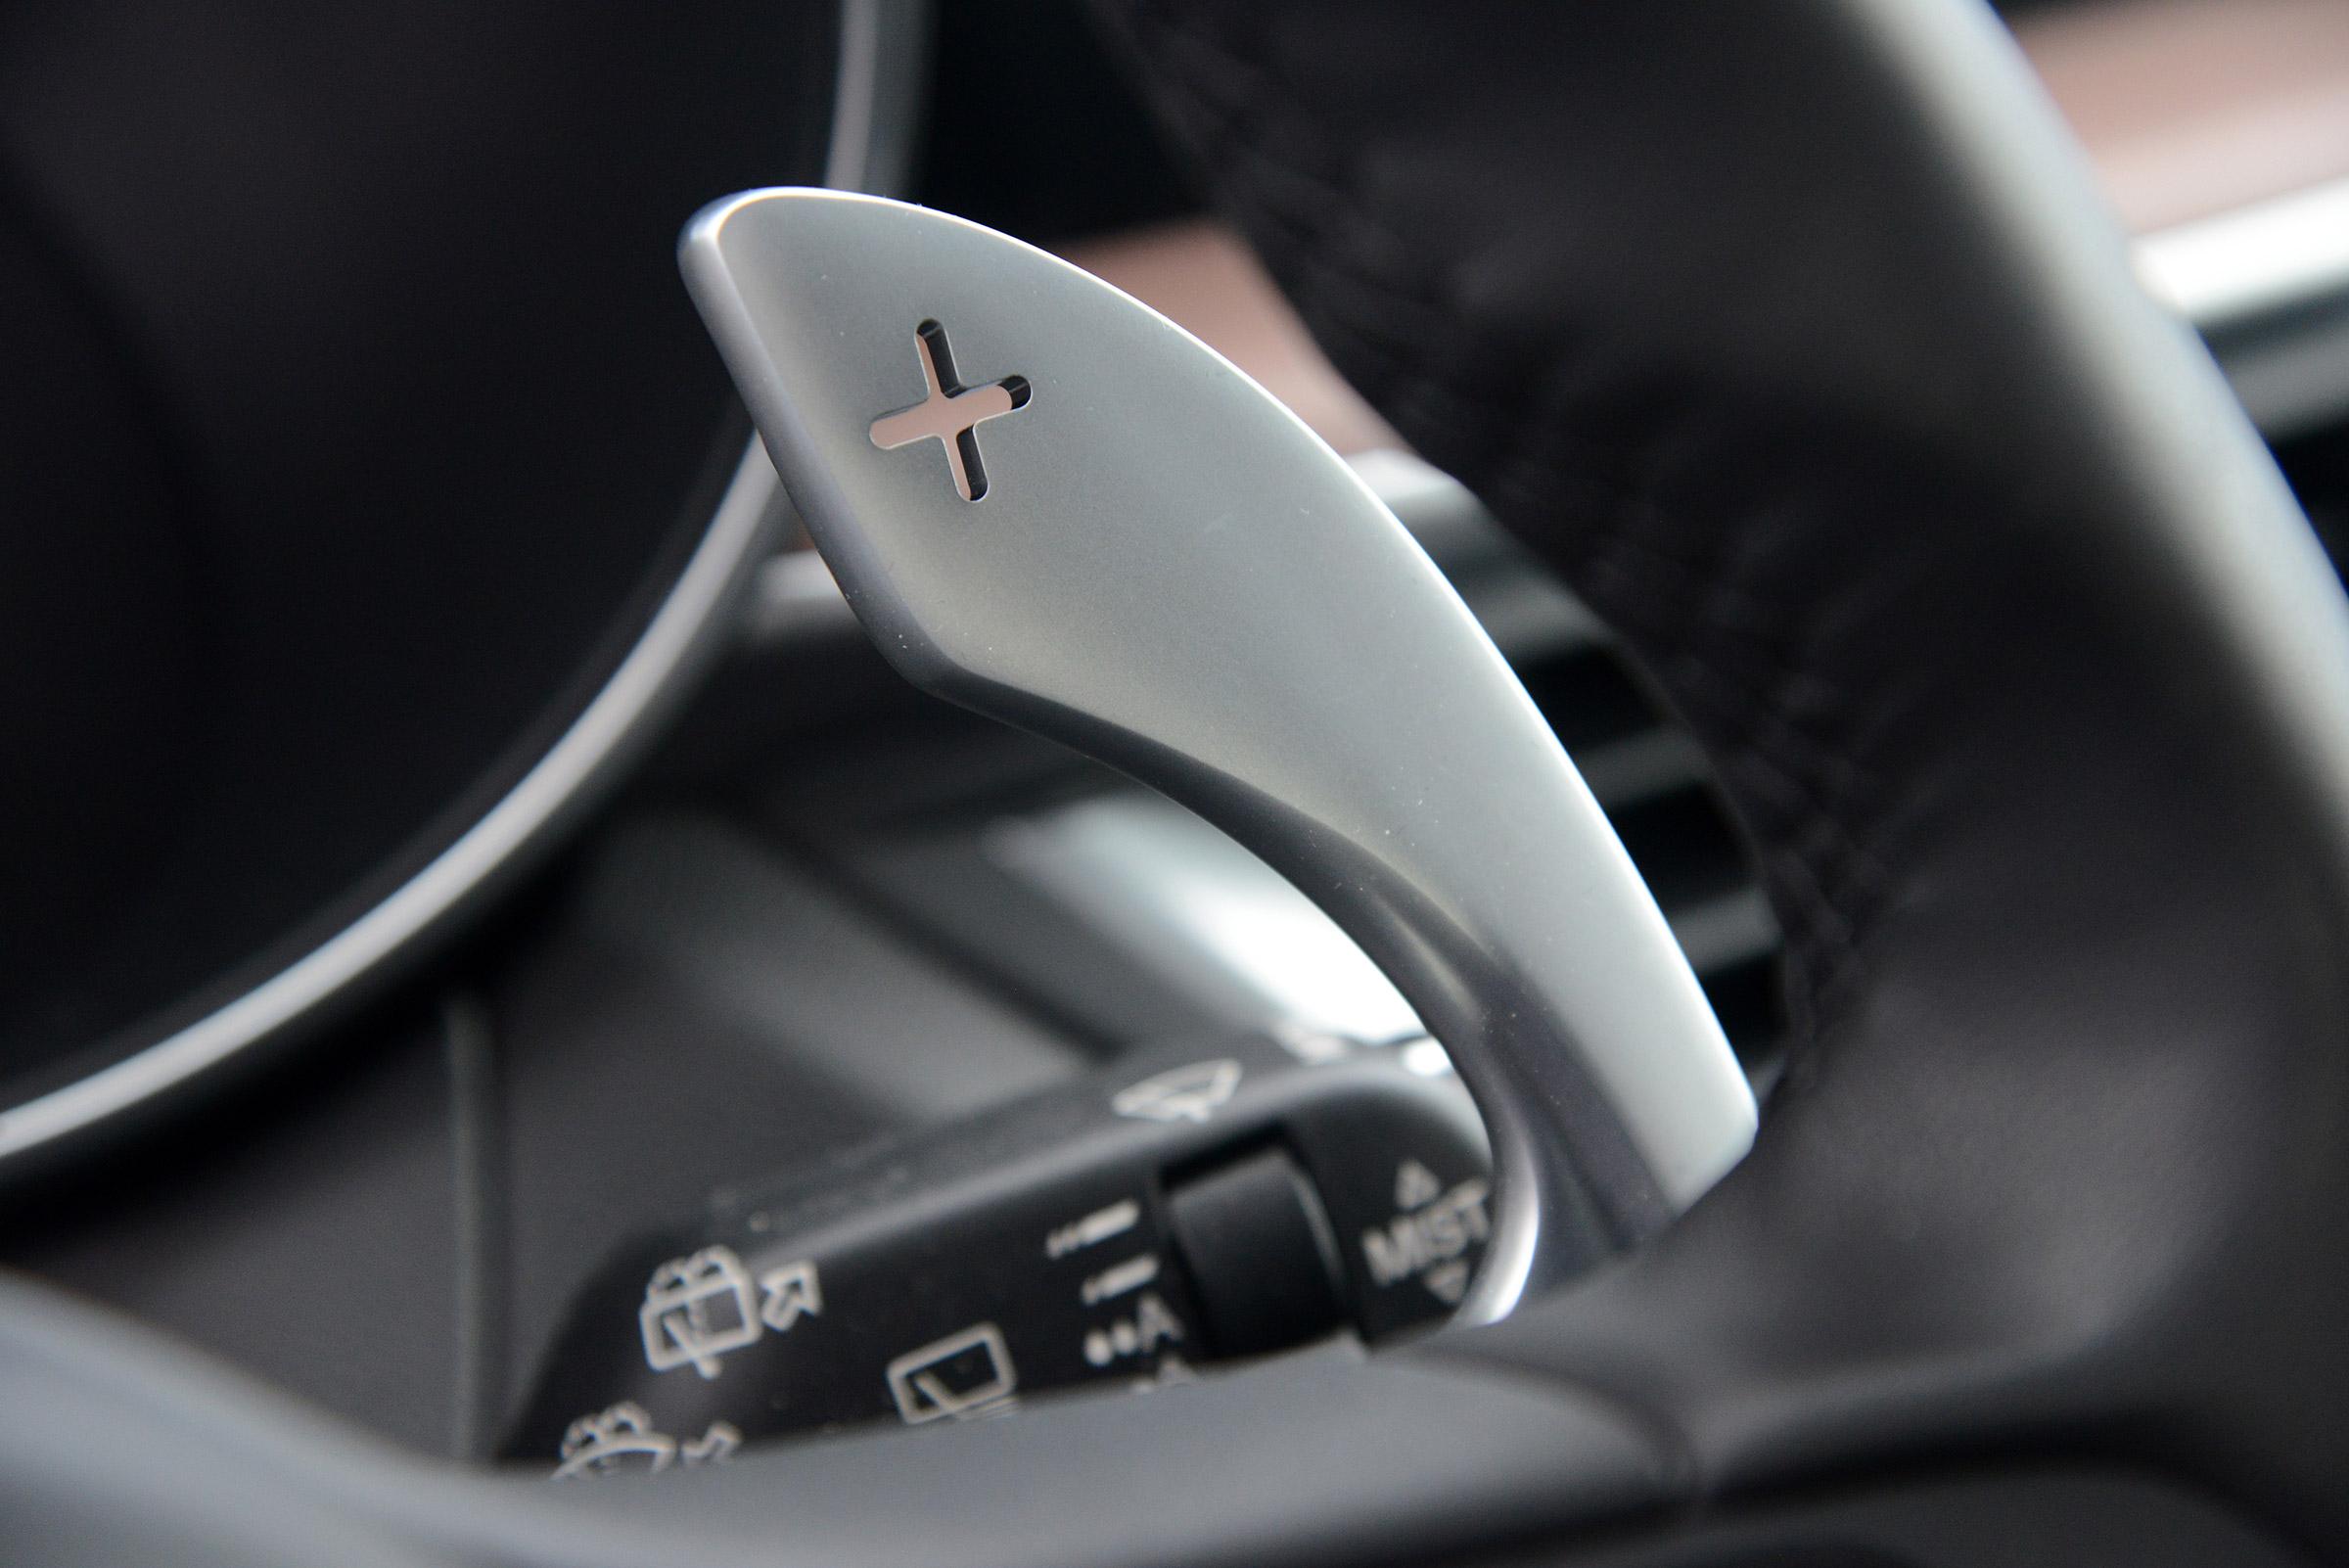 2017 Alfa Romeo Stelvio Interior View Paddle Shift (View 12 of 23)